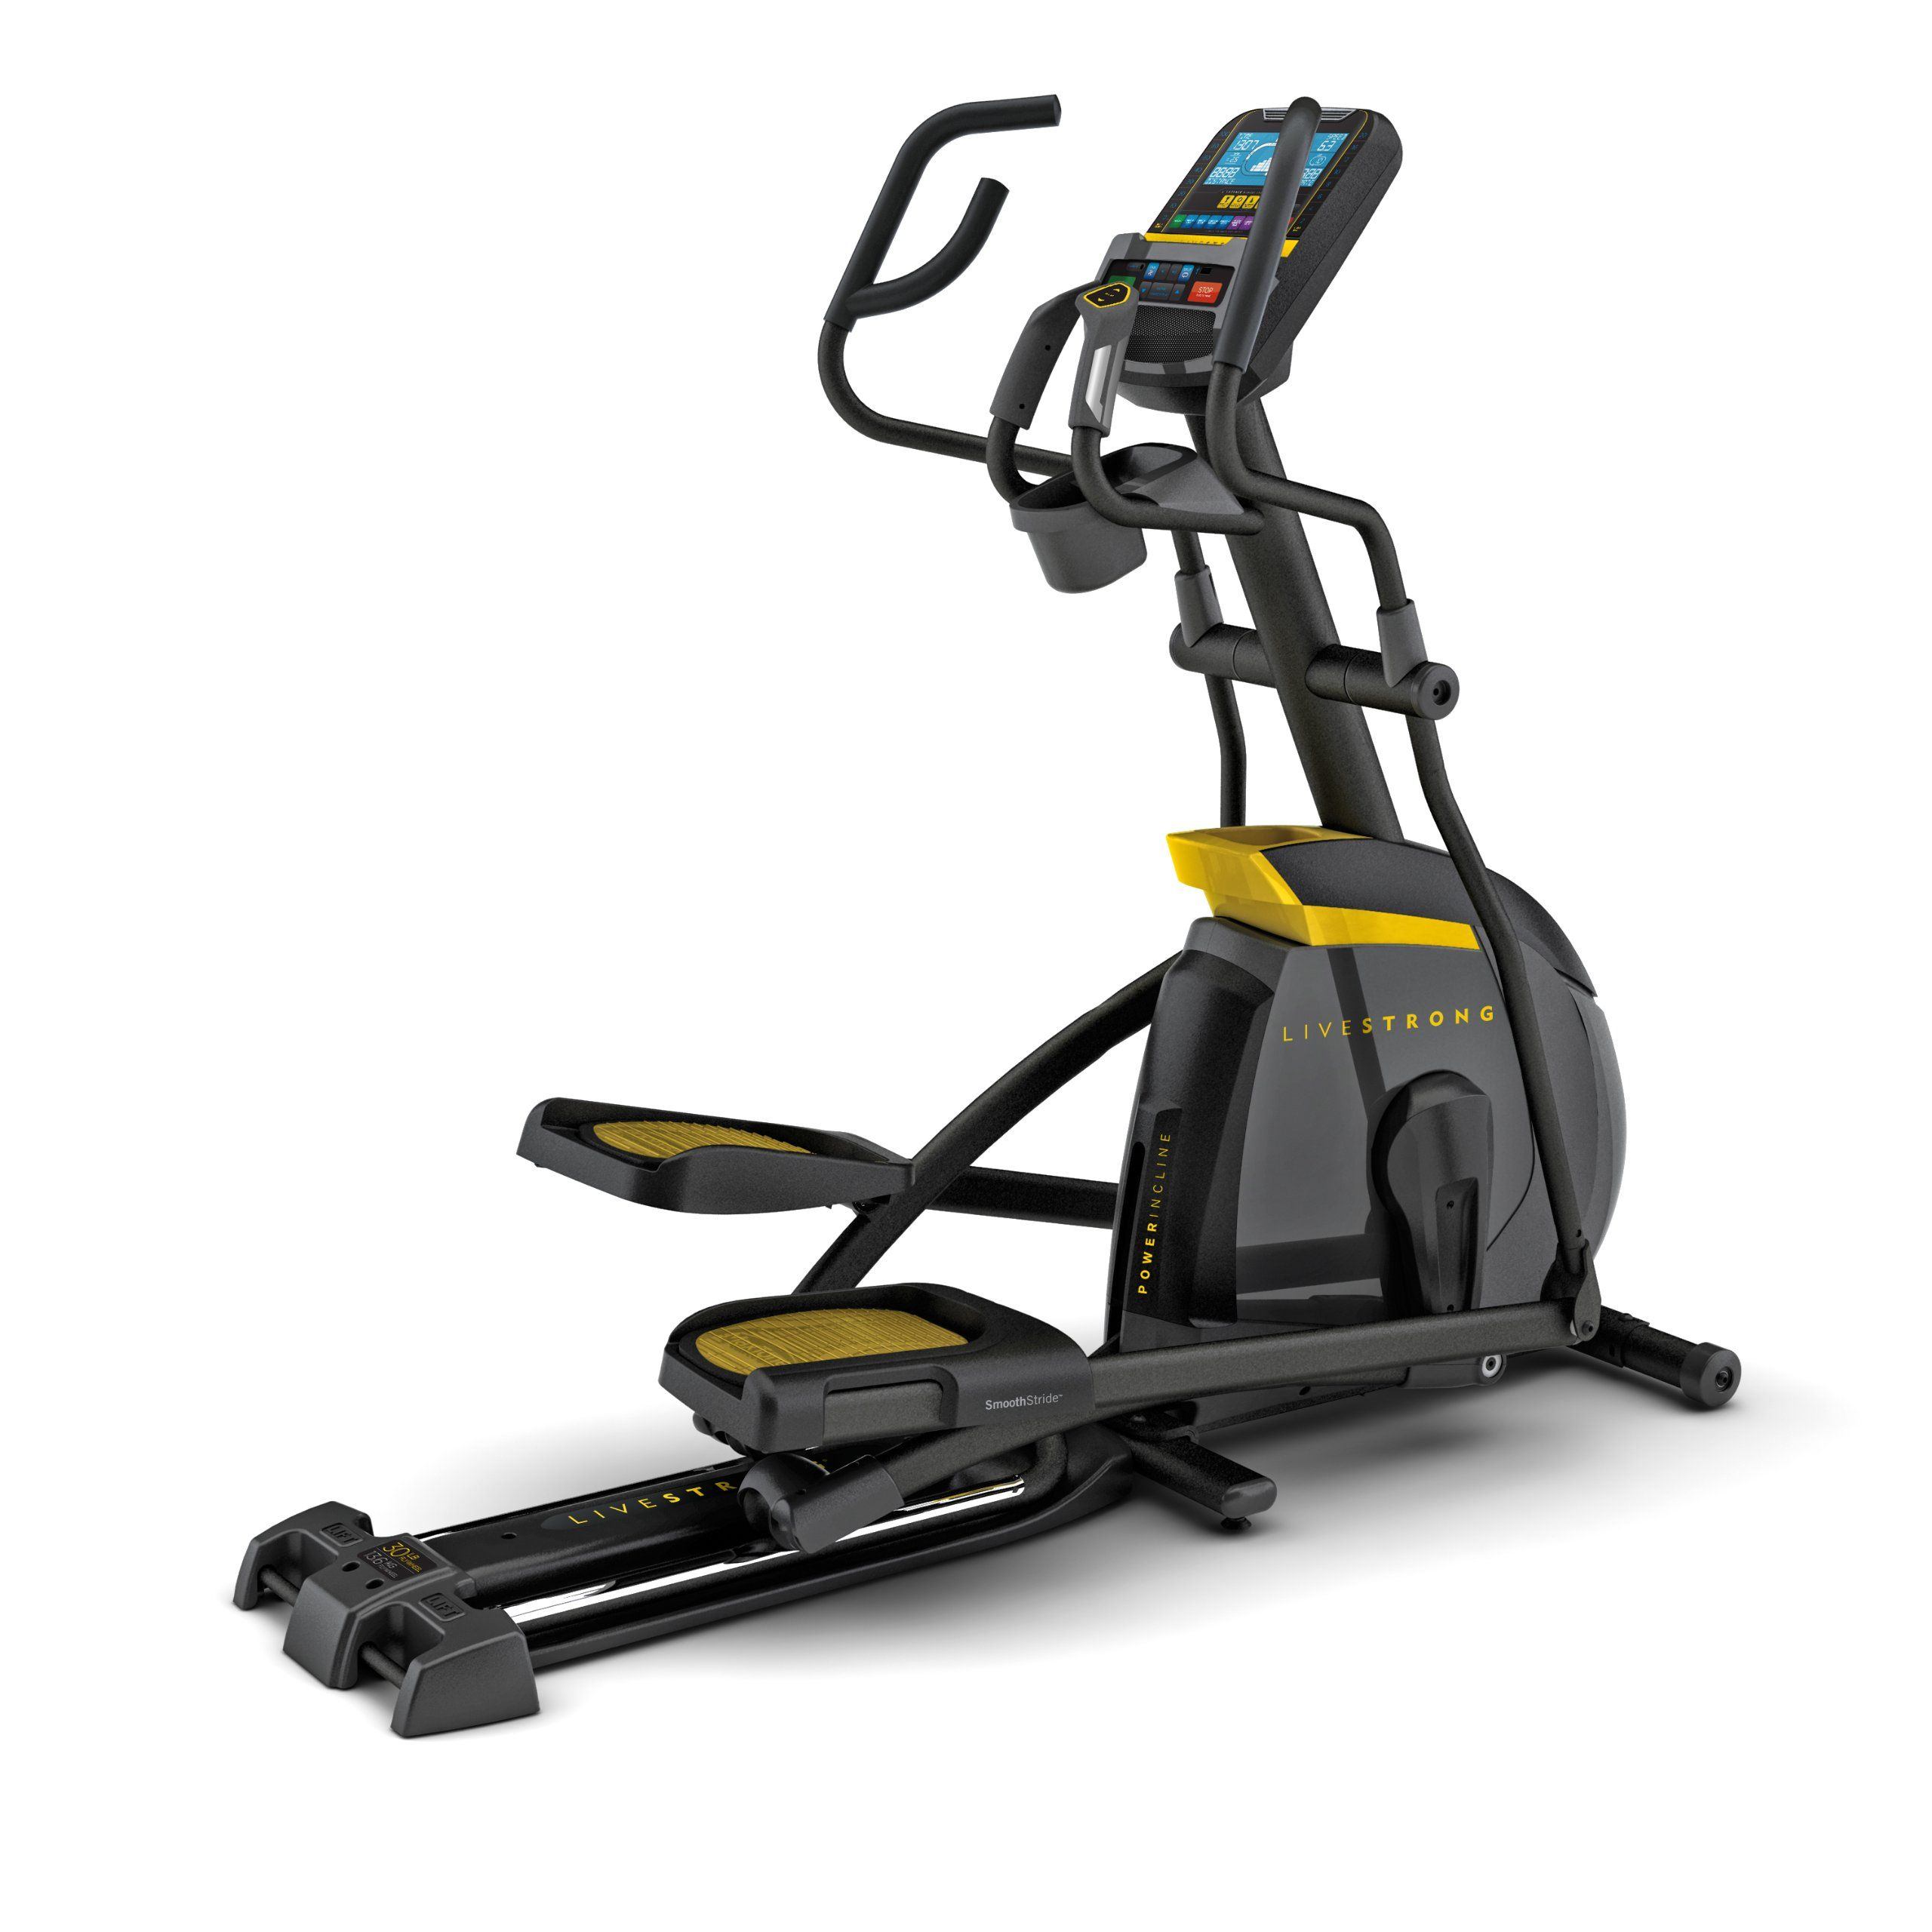 Livestrong Fitness Ls13 0e 2 Elliptical Review Elliptical Trainer No Equipment Workout Elliptical Trainers